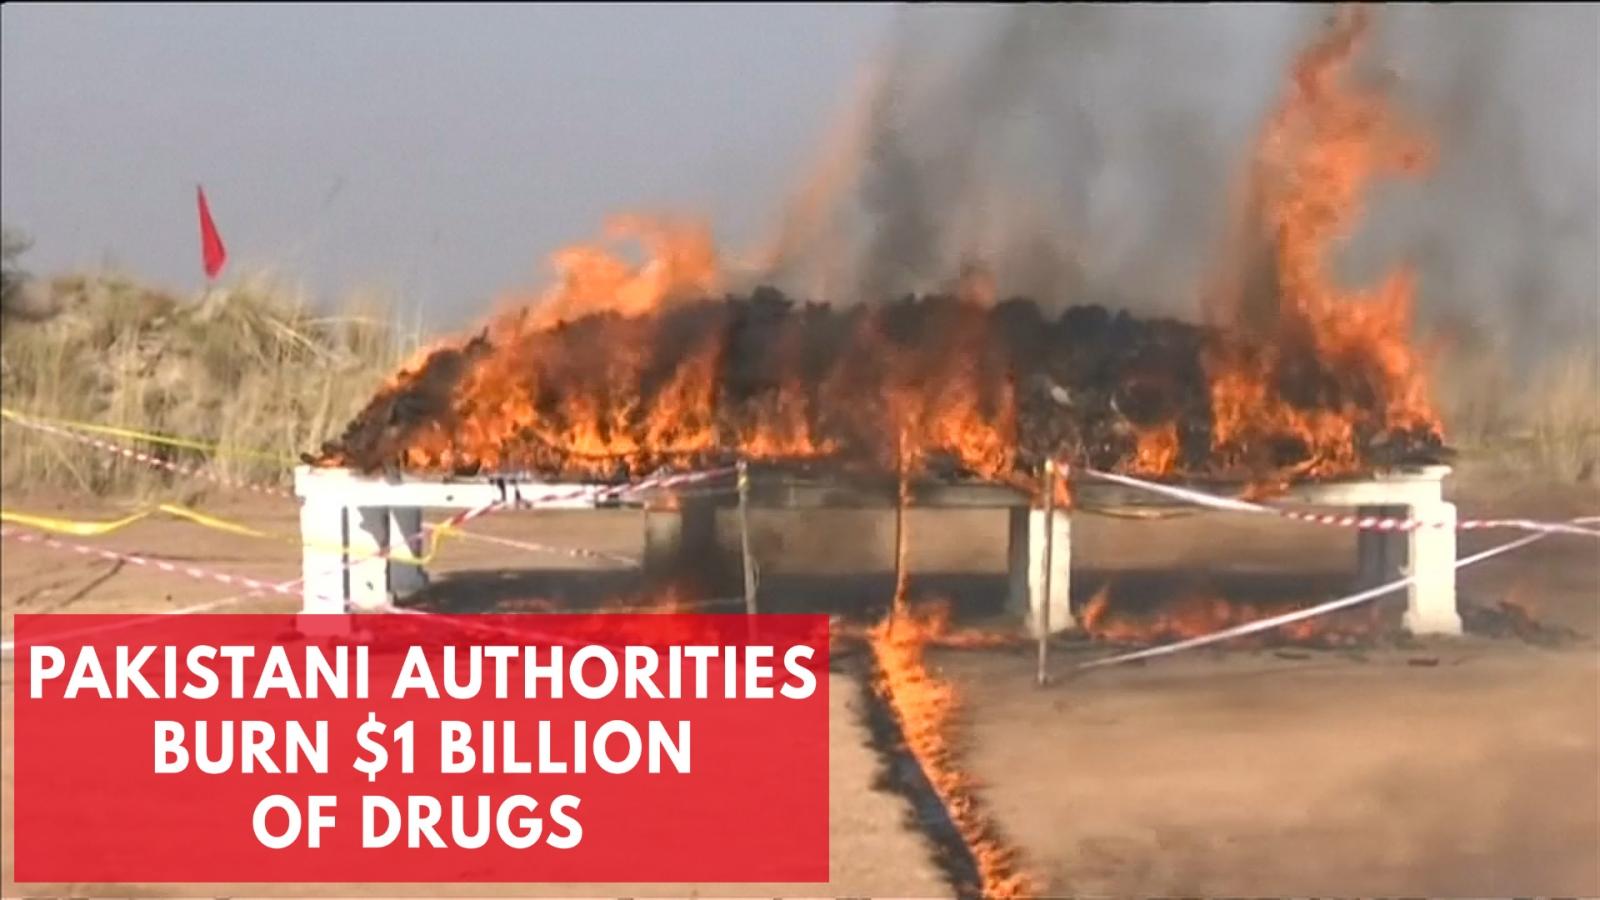 1-billion-of-drugs-burned-by-pakistani-authorities